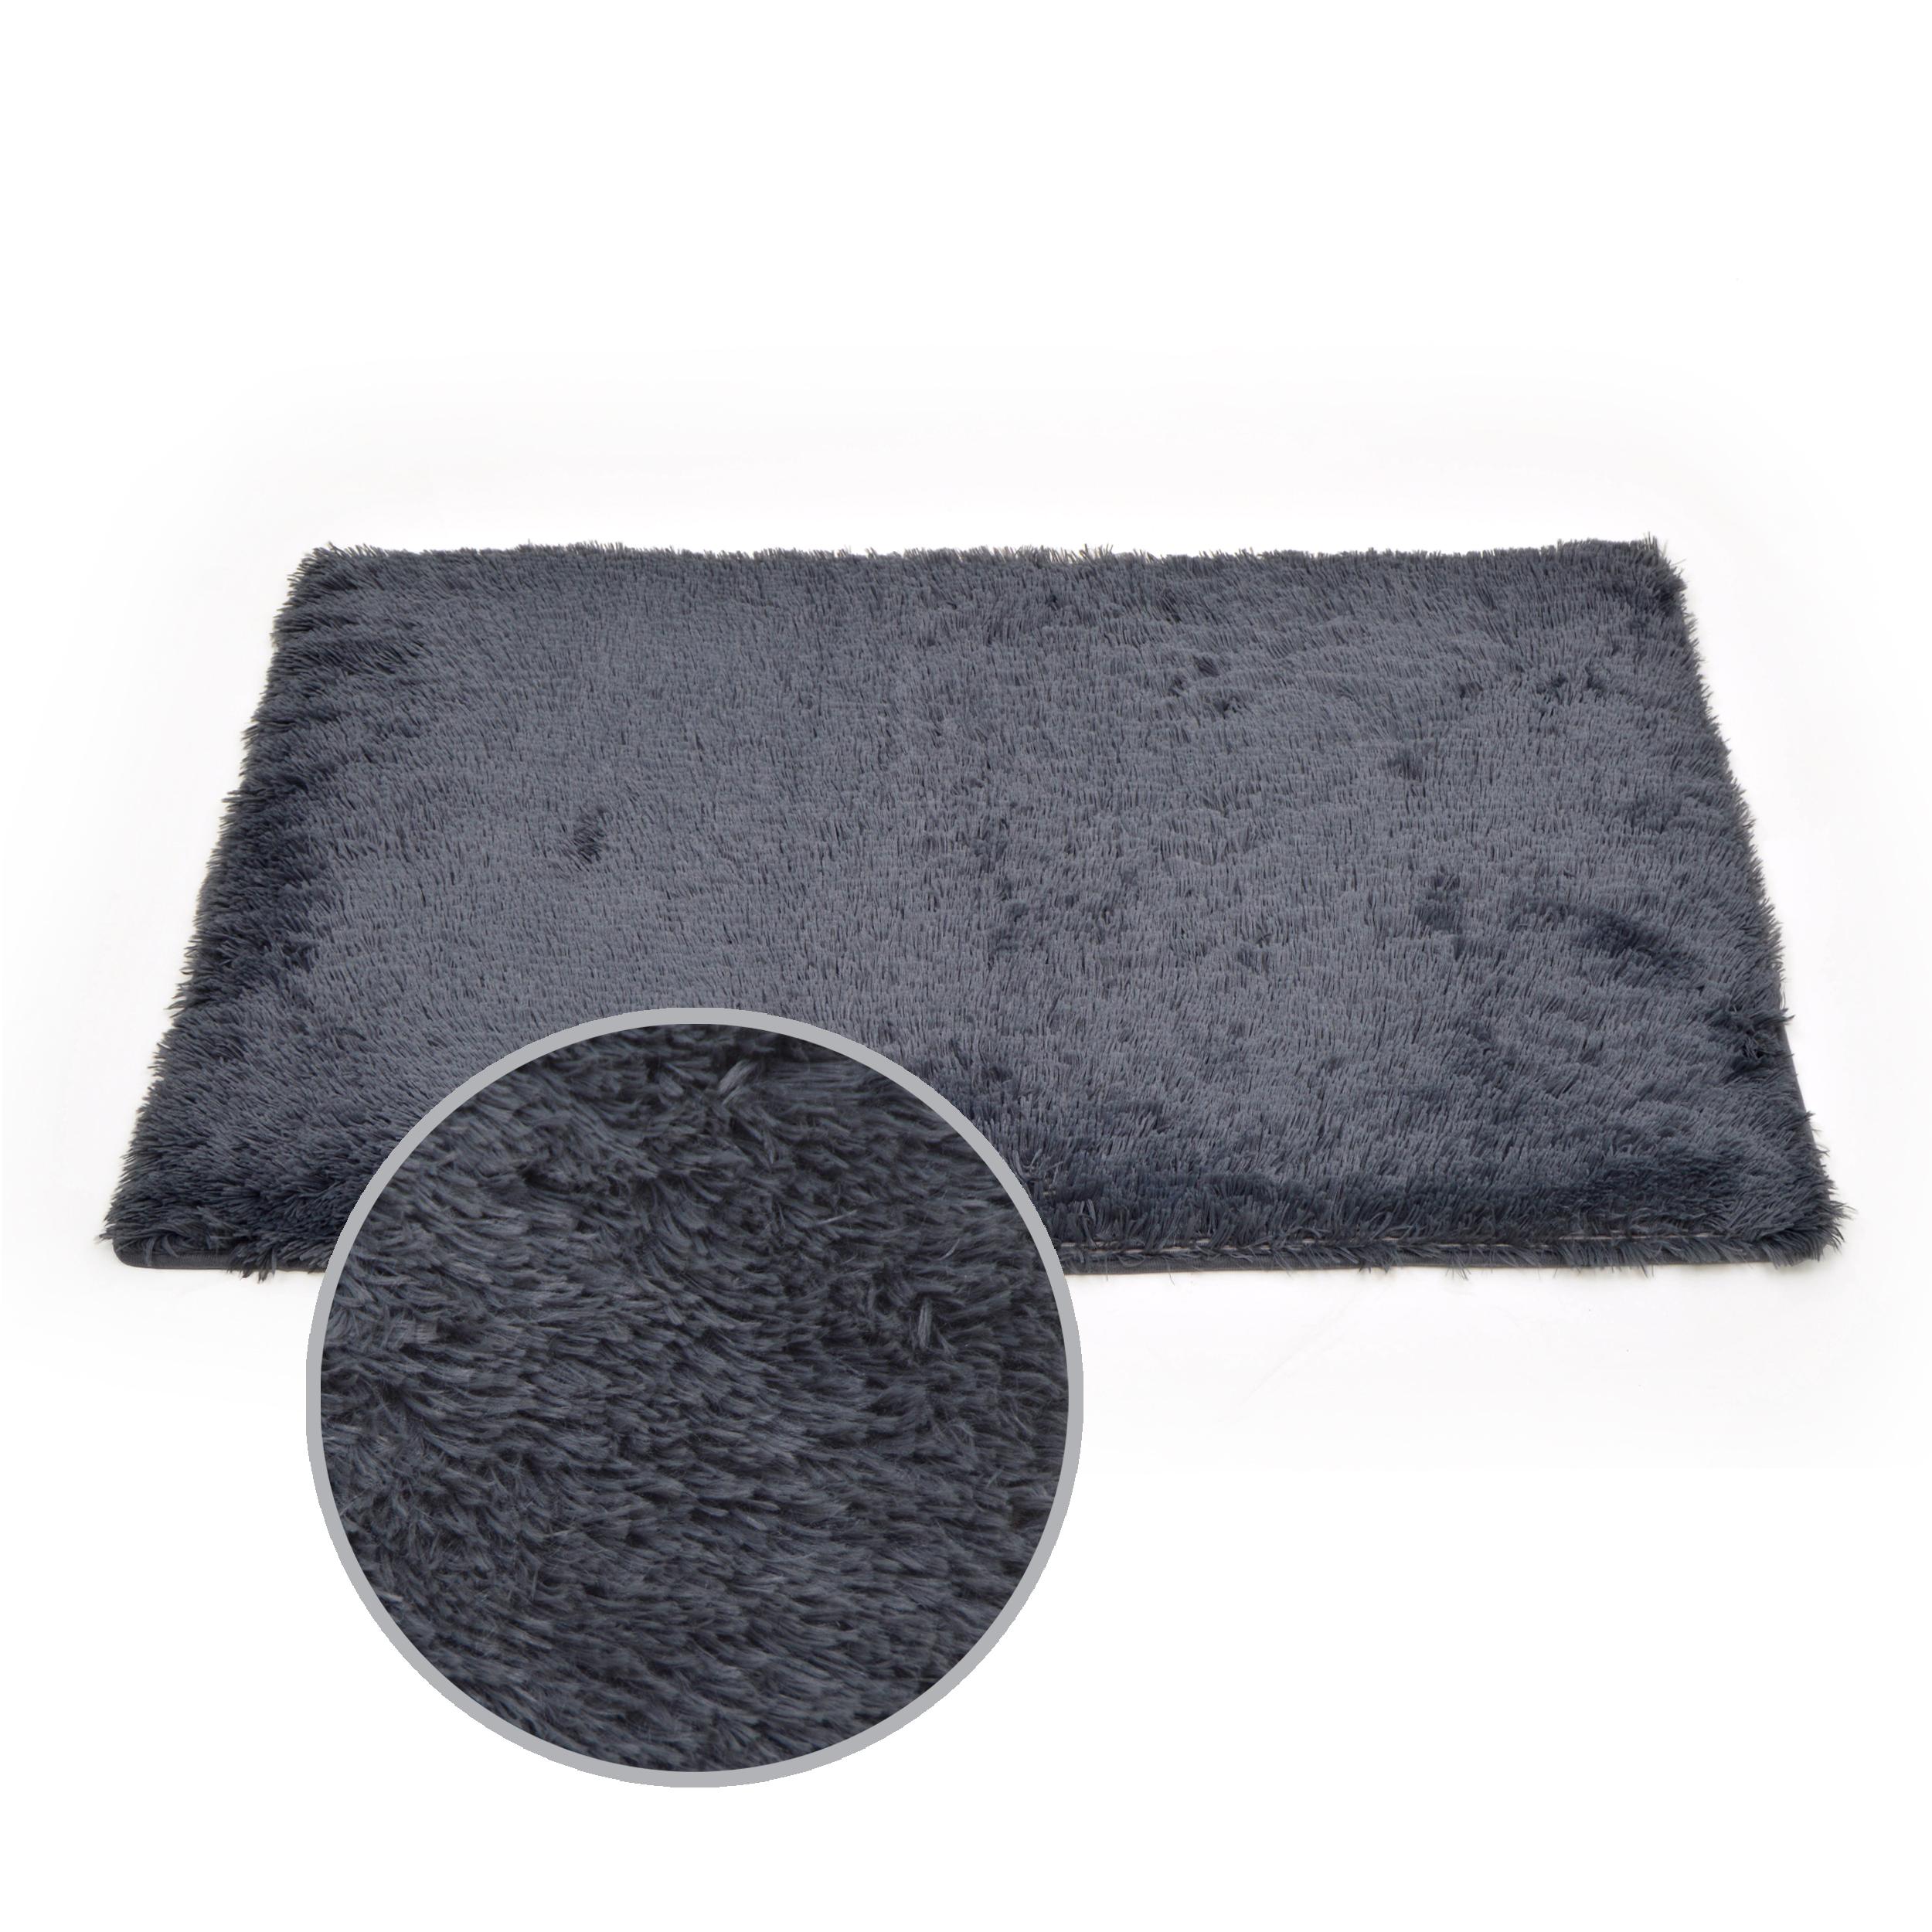 badgarnitur heaven grau badezimmer dusch bade matte. Black Bedroom Furniture Sets. Home Design Ideas